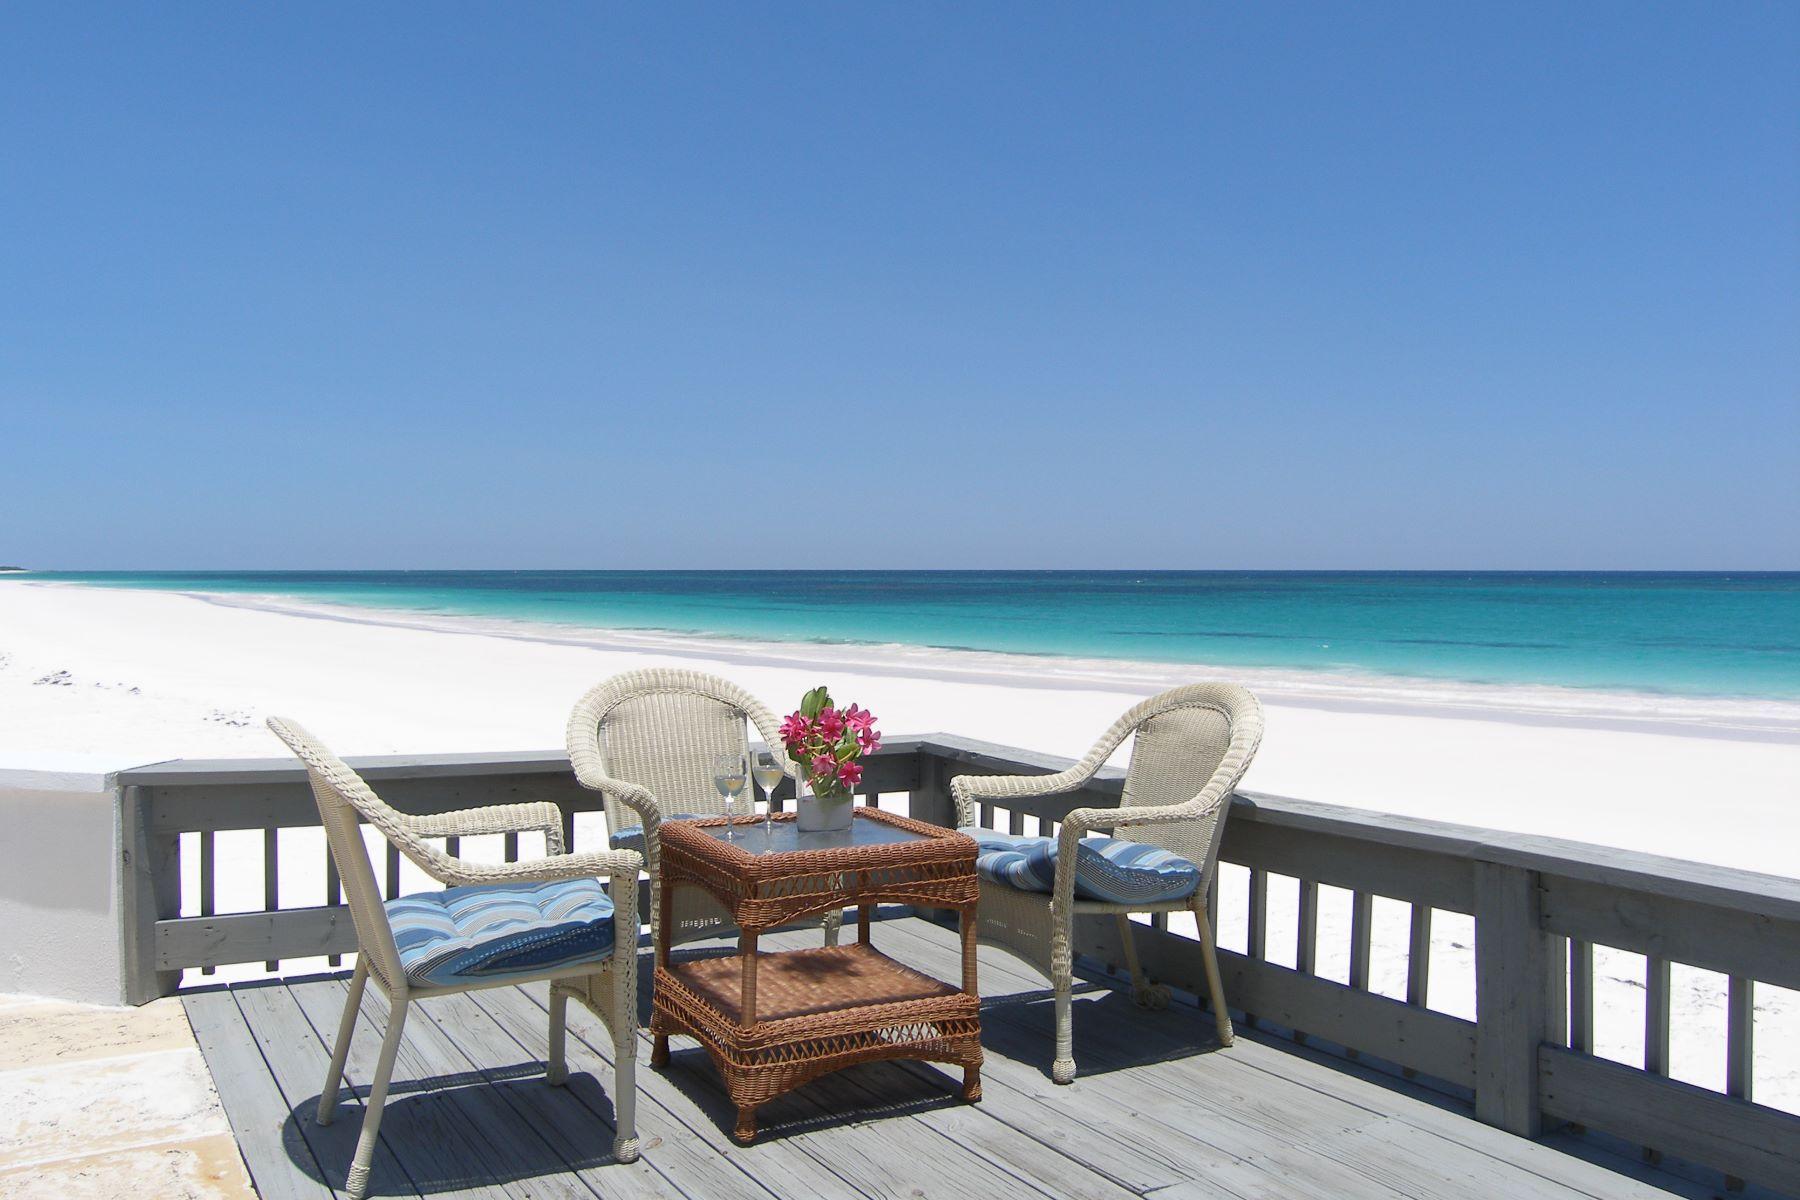 Single Family Home for Sale at Windermere Beachfront Windermere Island, Eleuthera, Bahamas